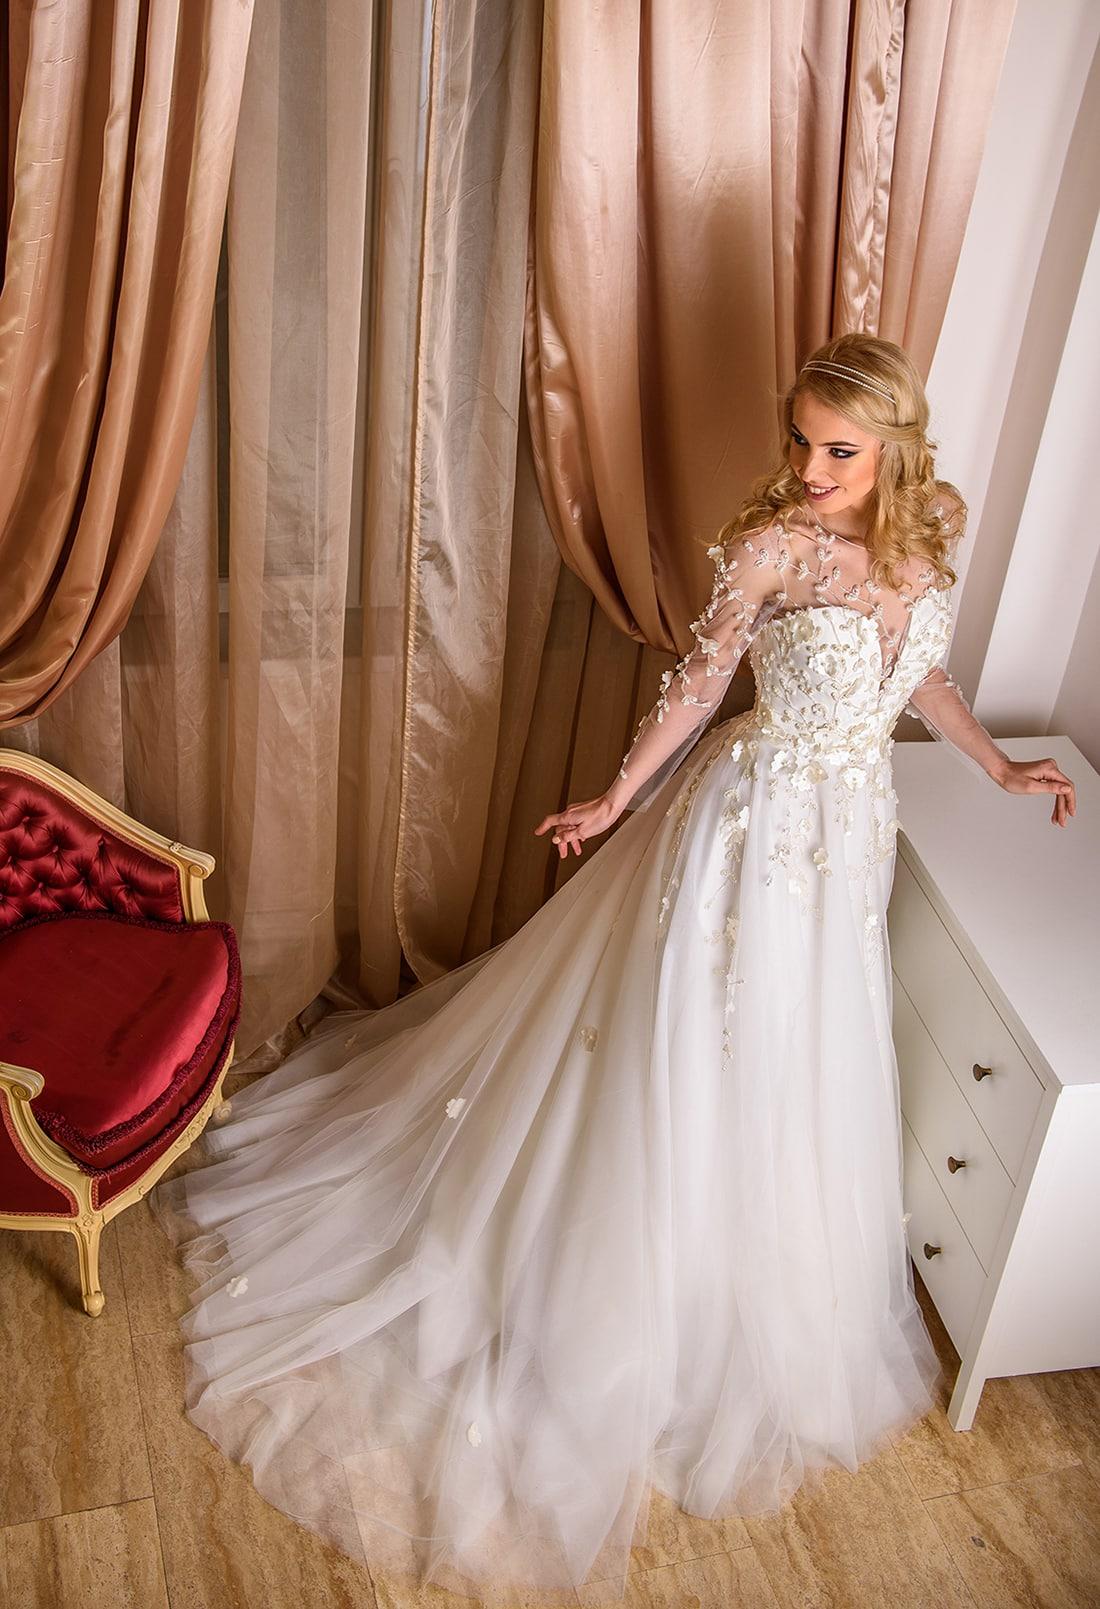 Natasha Model - Colectia Baroque - Adora Sposa (4)